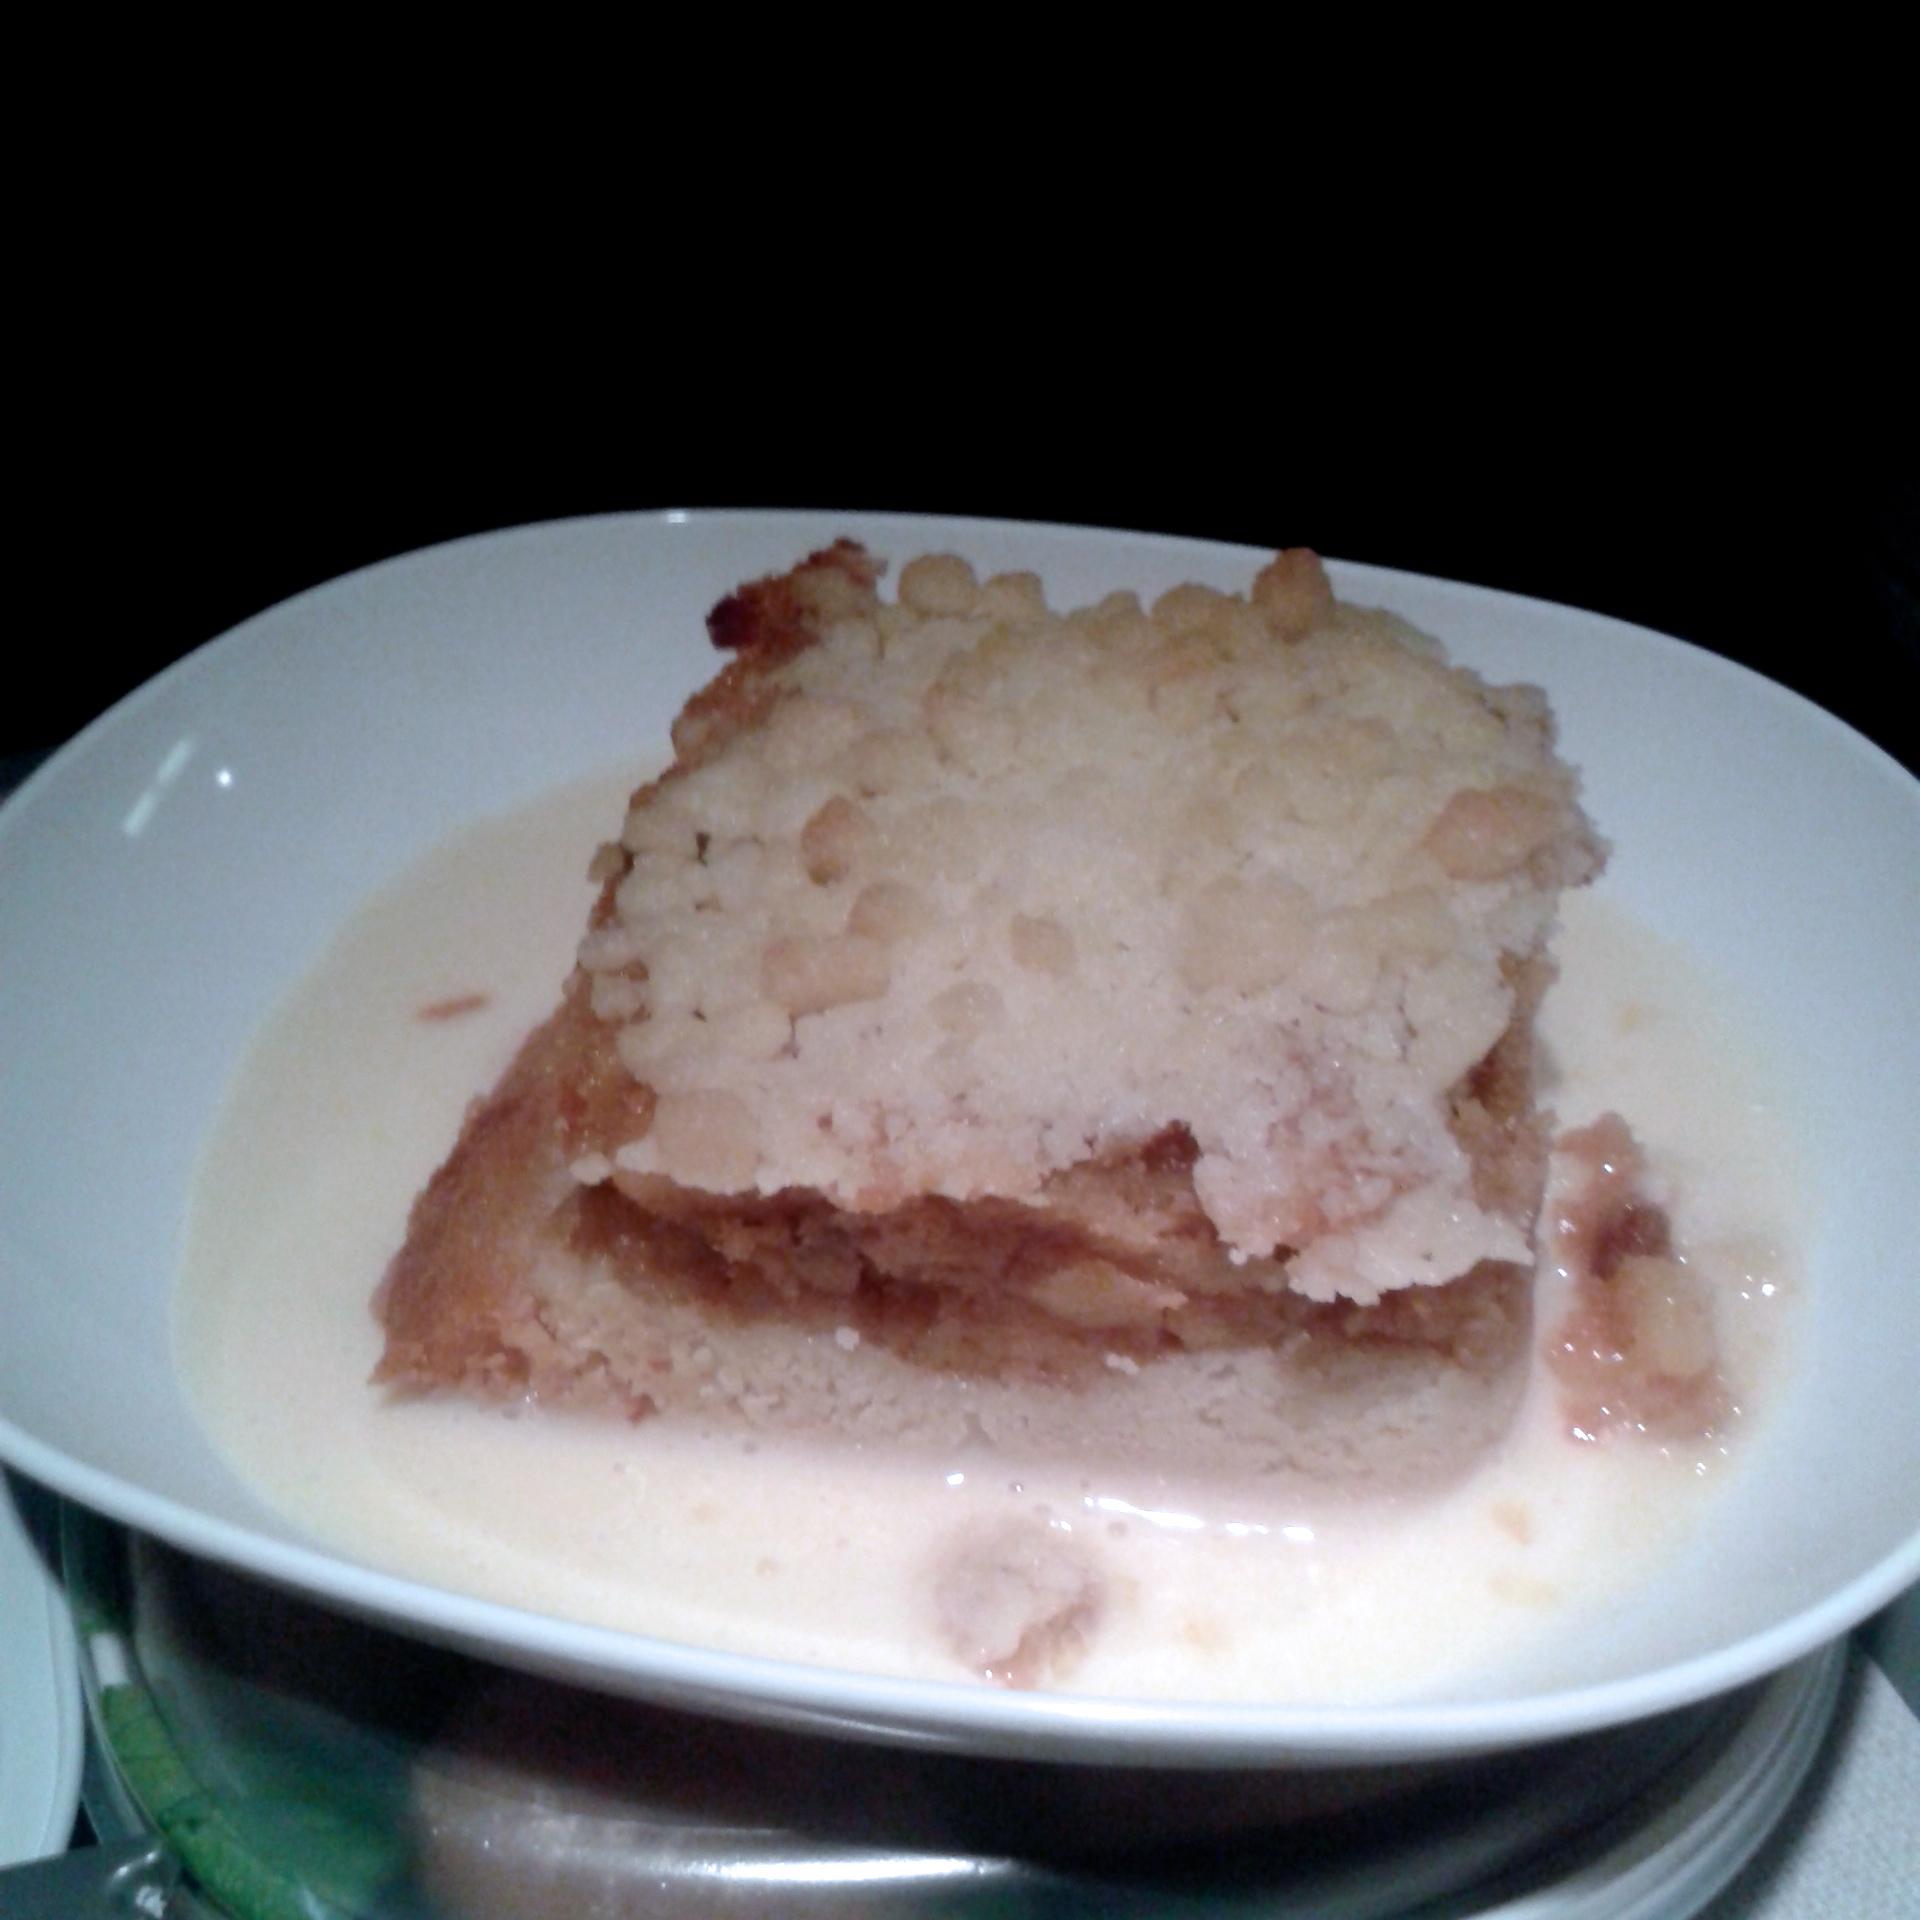 http://i2.wp.com/fatgayvegan.com/wp-content/uploads/2014/03/dessert.jpg?fit=1920%2C1920